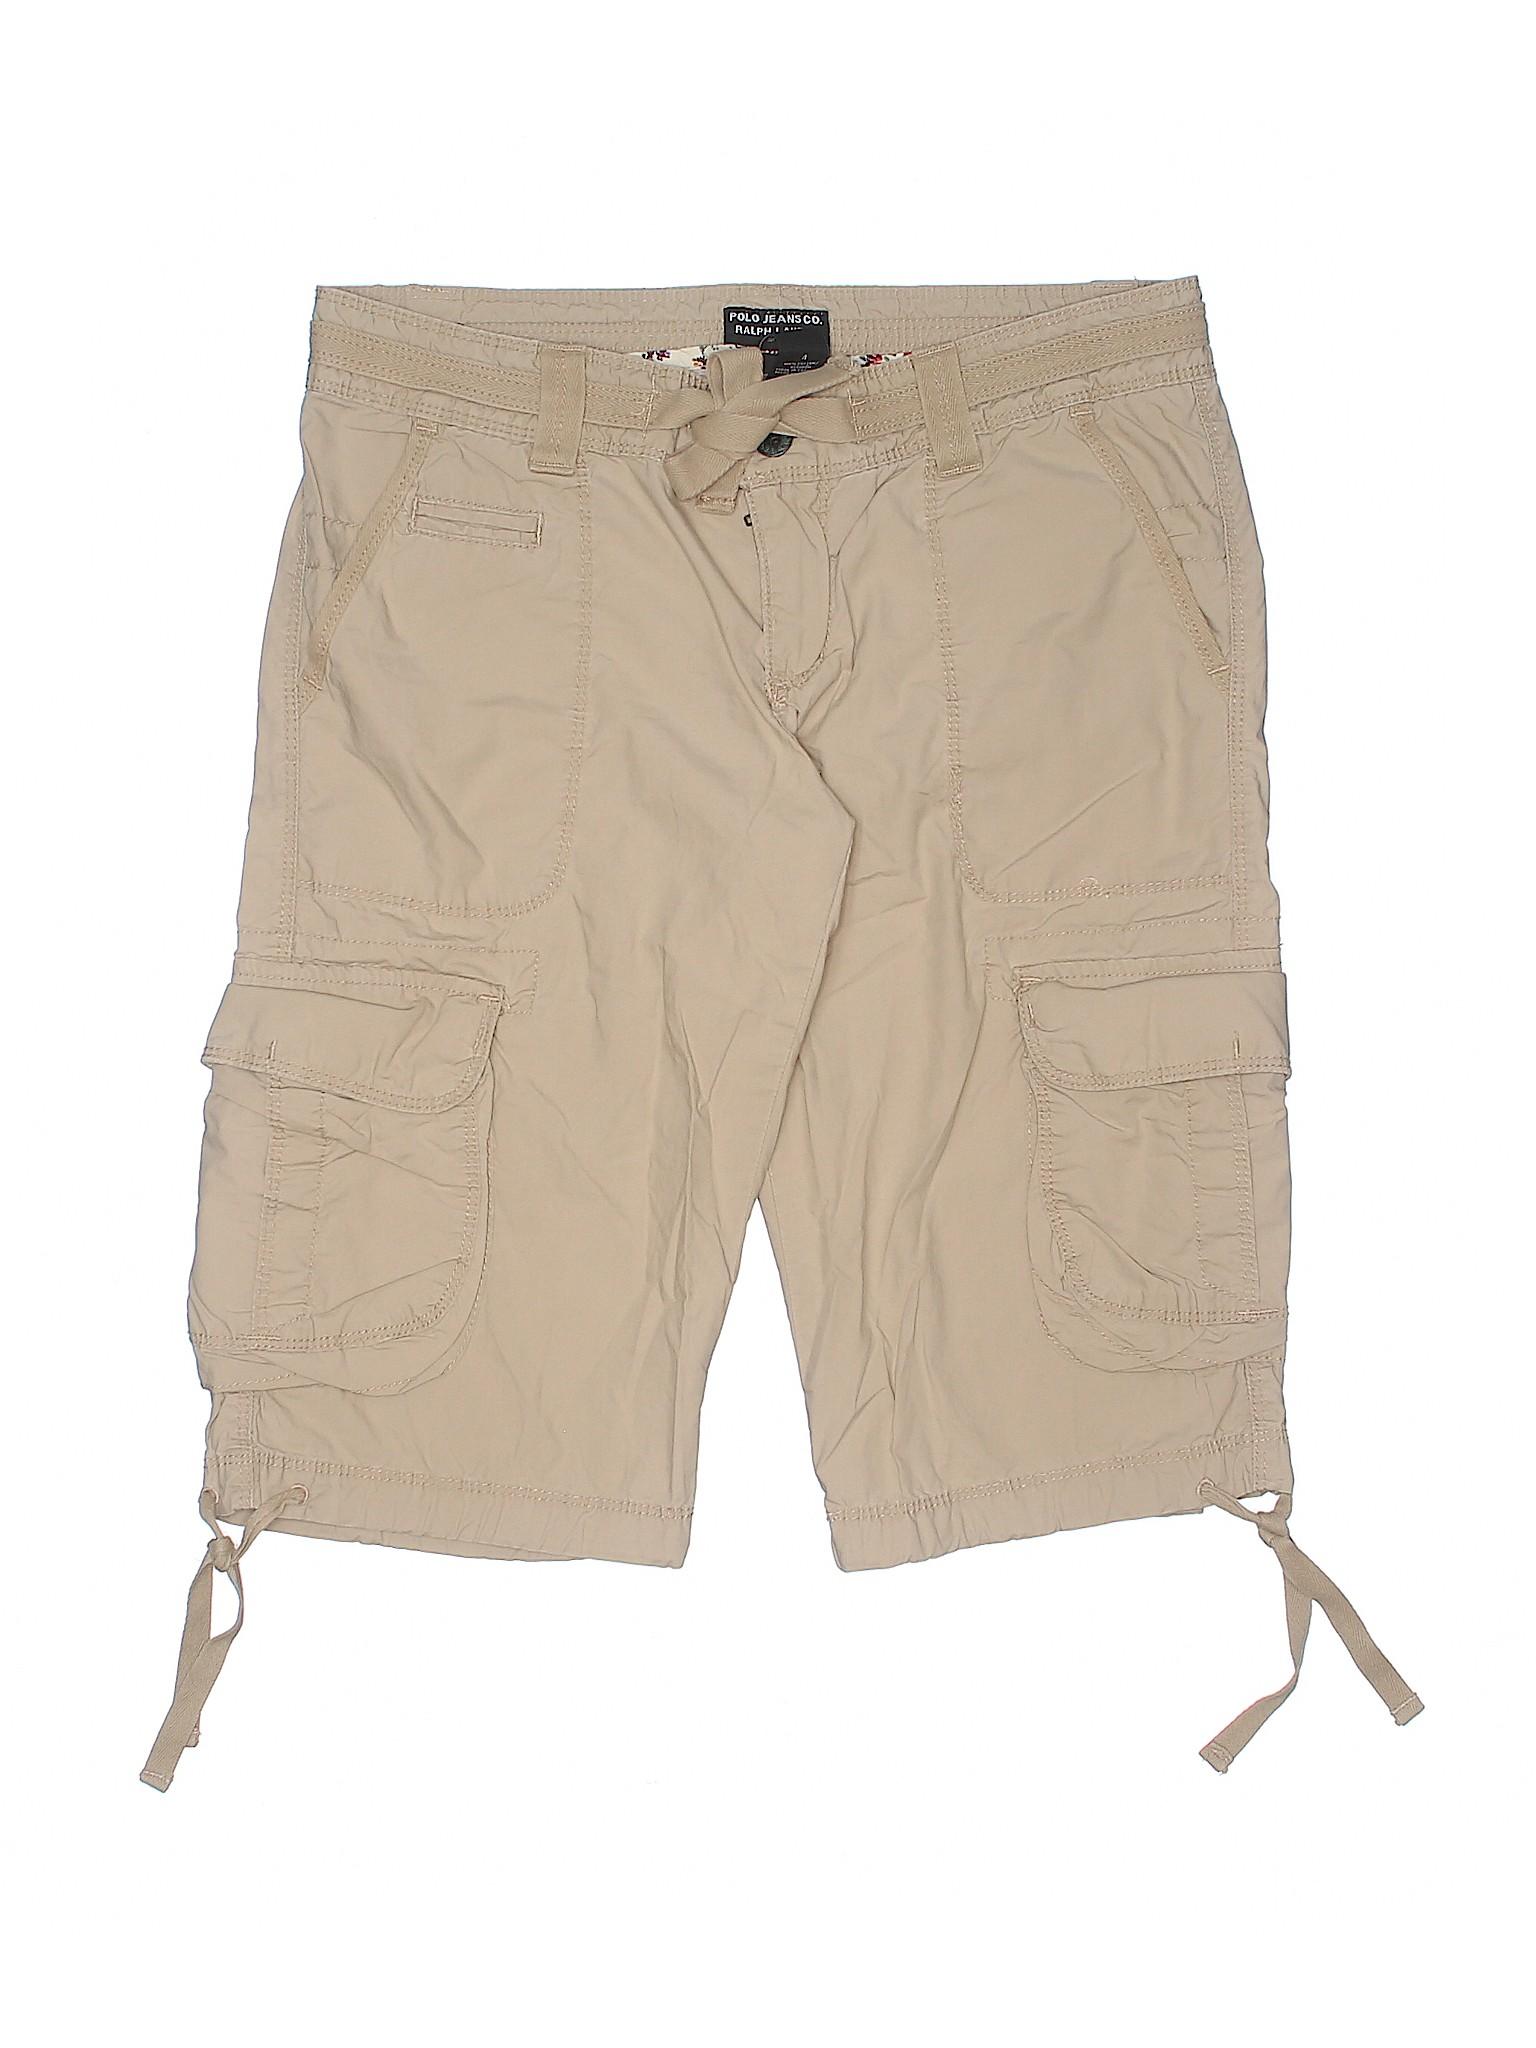 by Lauren Boutique Polo Co Jeans Shorts Cargo Ralph winter wnaYqarI